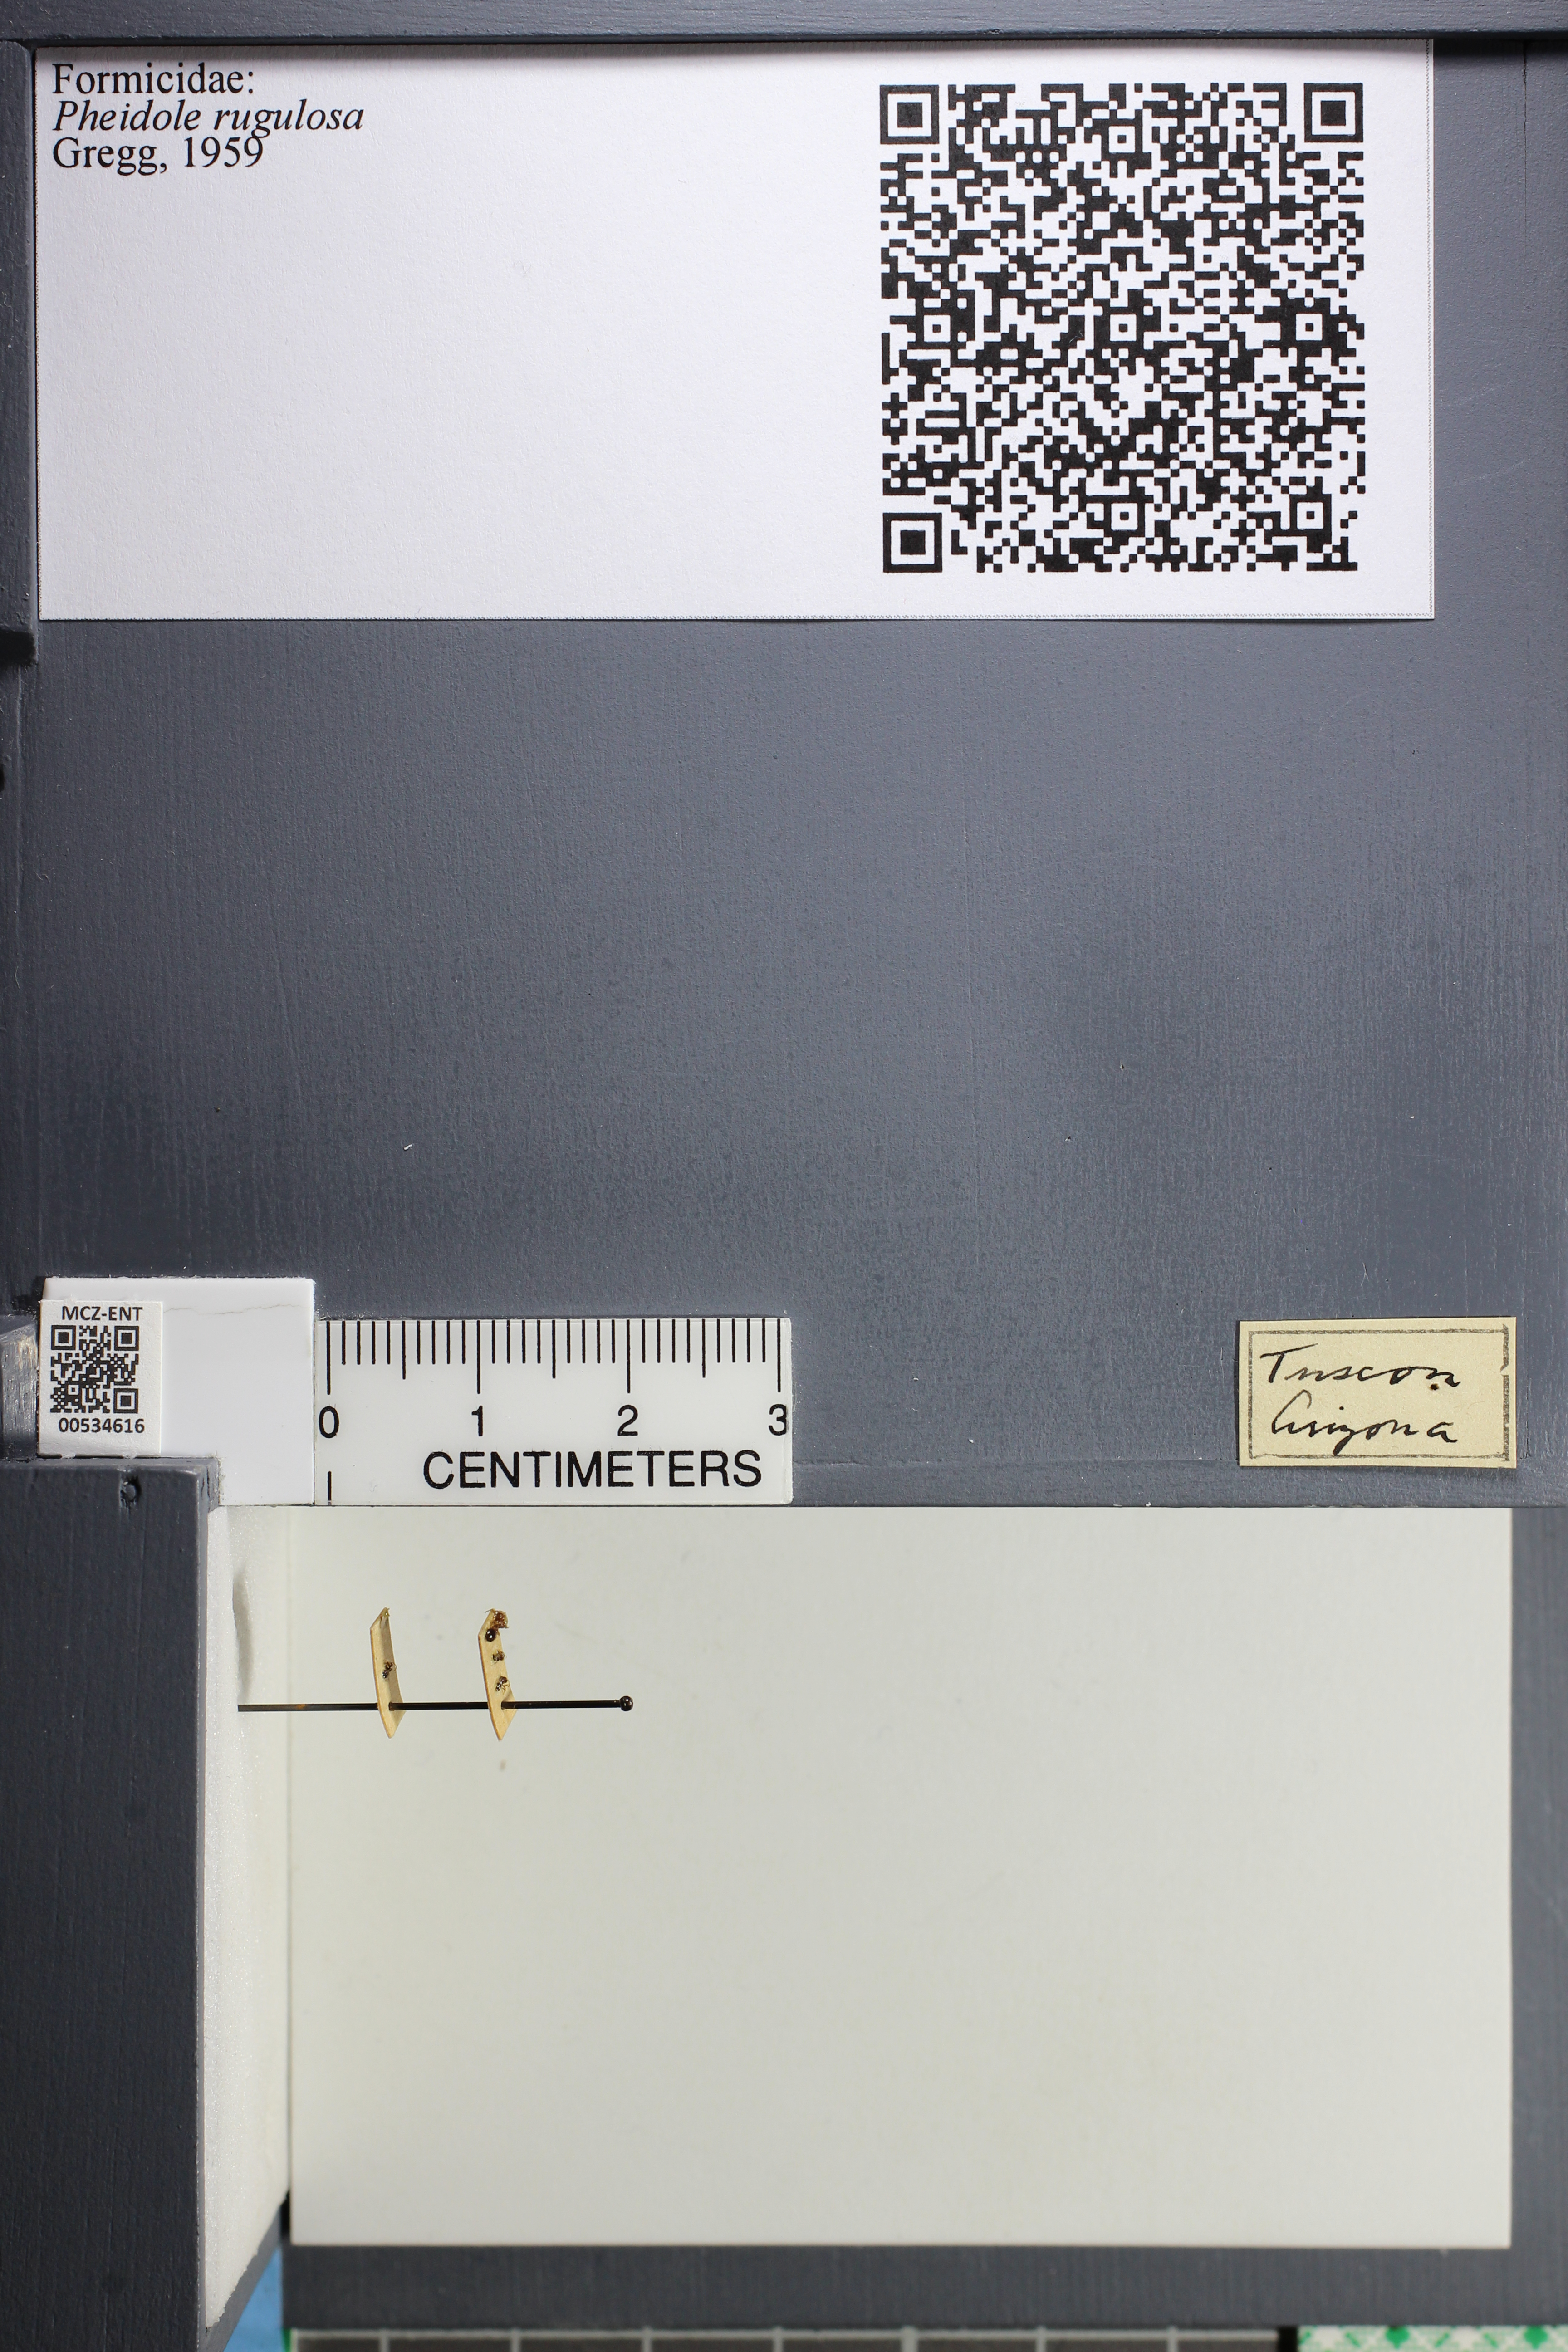 Media of type image, MCZ:Ent:534616 Identified as Pheidole rugulosa.